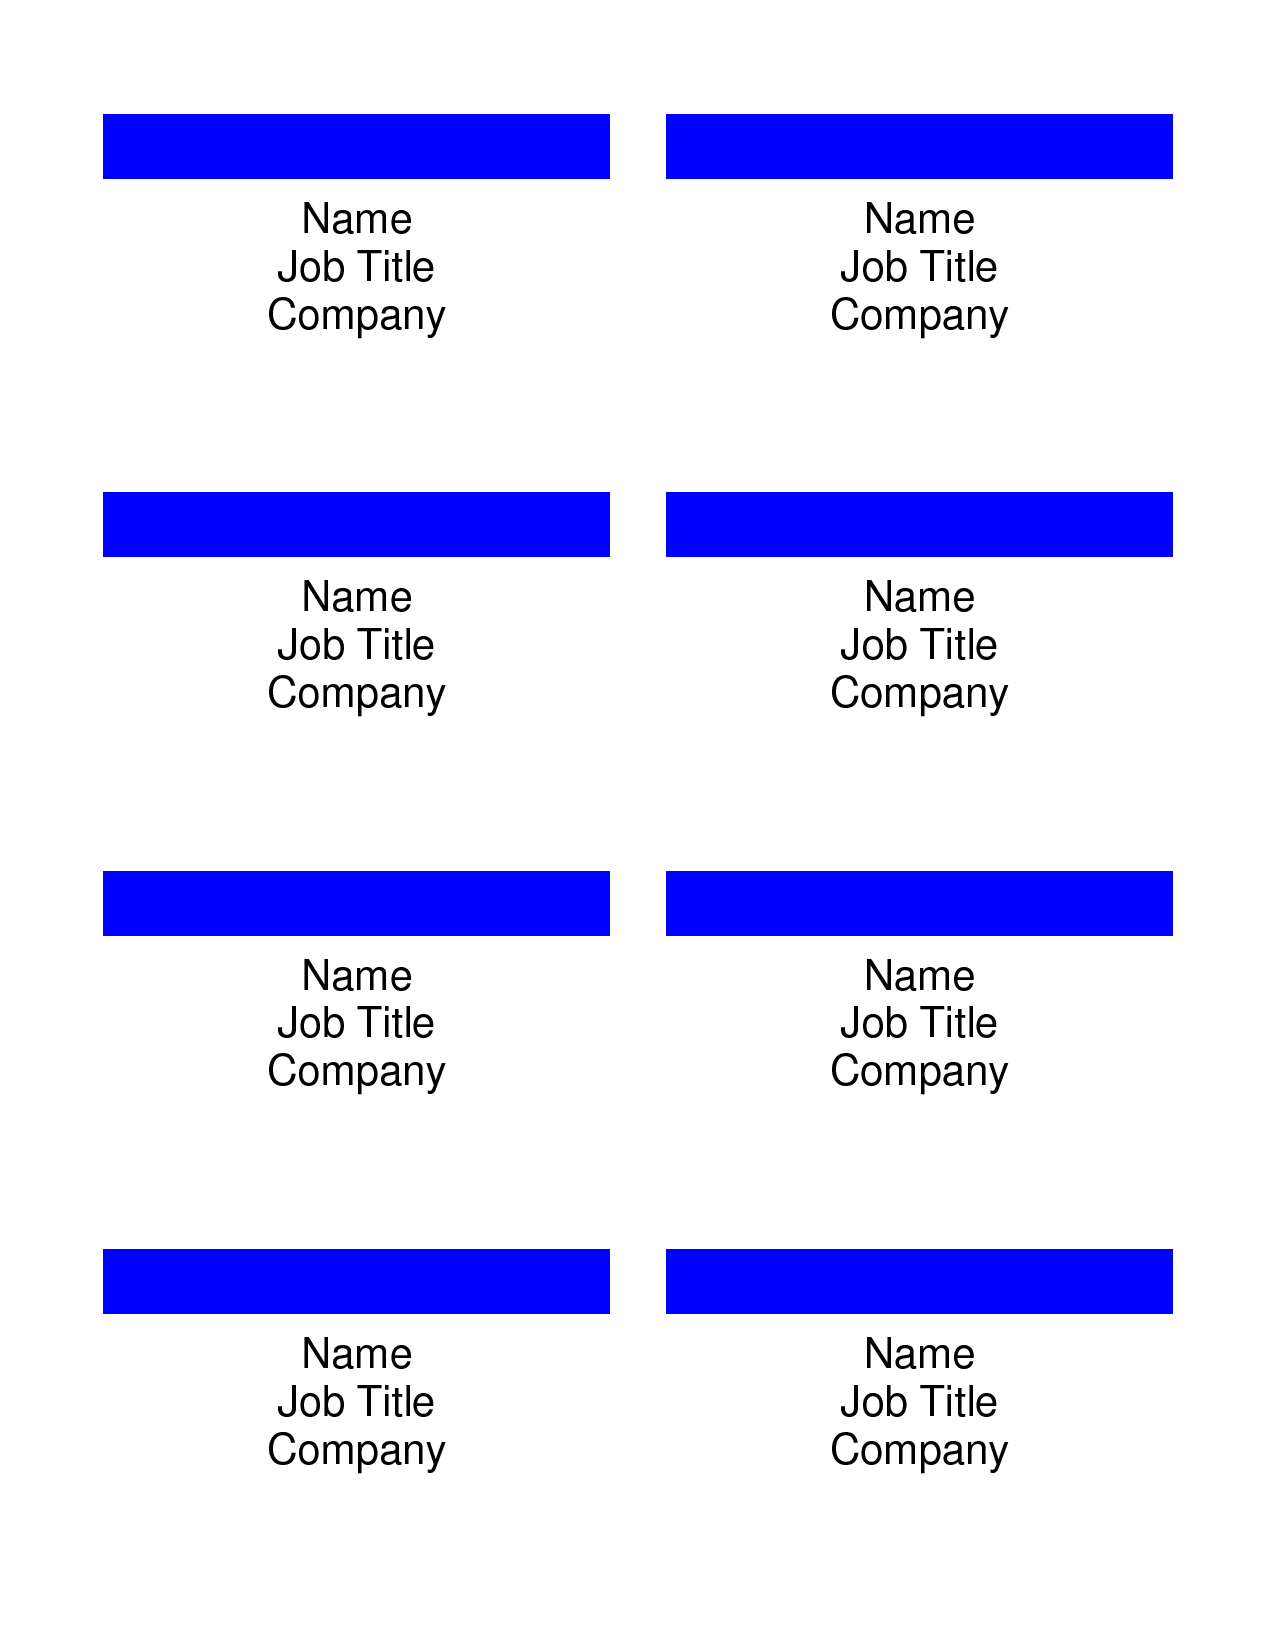 Name Badge Templates: Custom Name Badge Templates Inside Visitor Badge Template Word